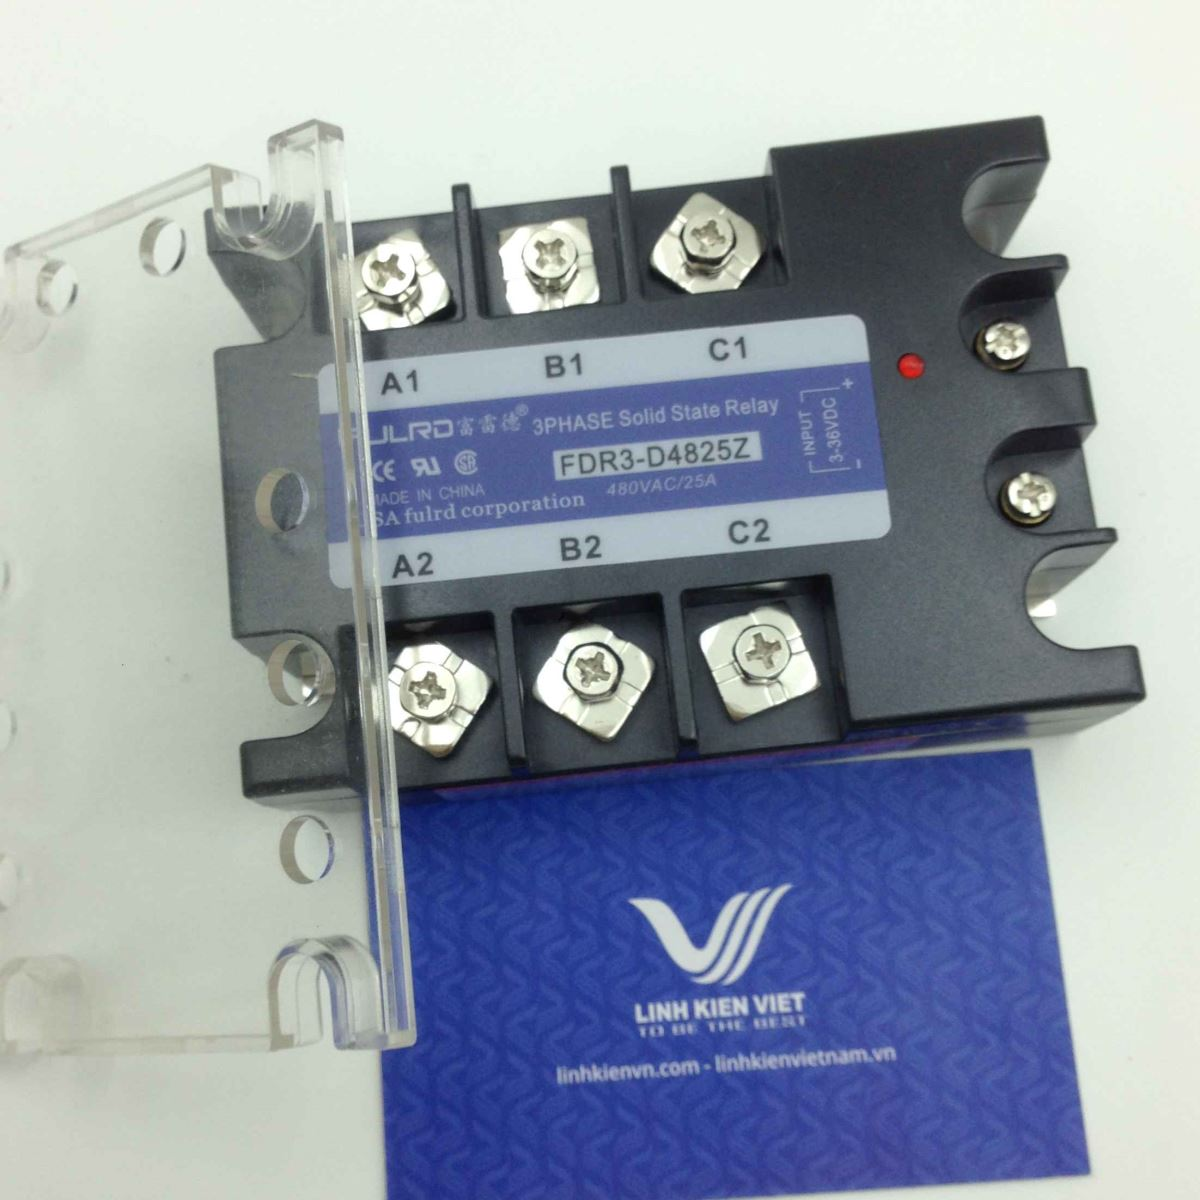 Relay bán dẫn 3 pha SSR 25A FDR3-D4825Z - (KB4H3)